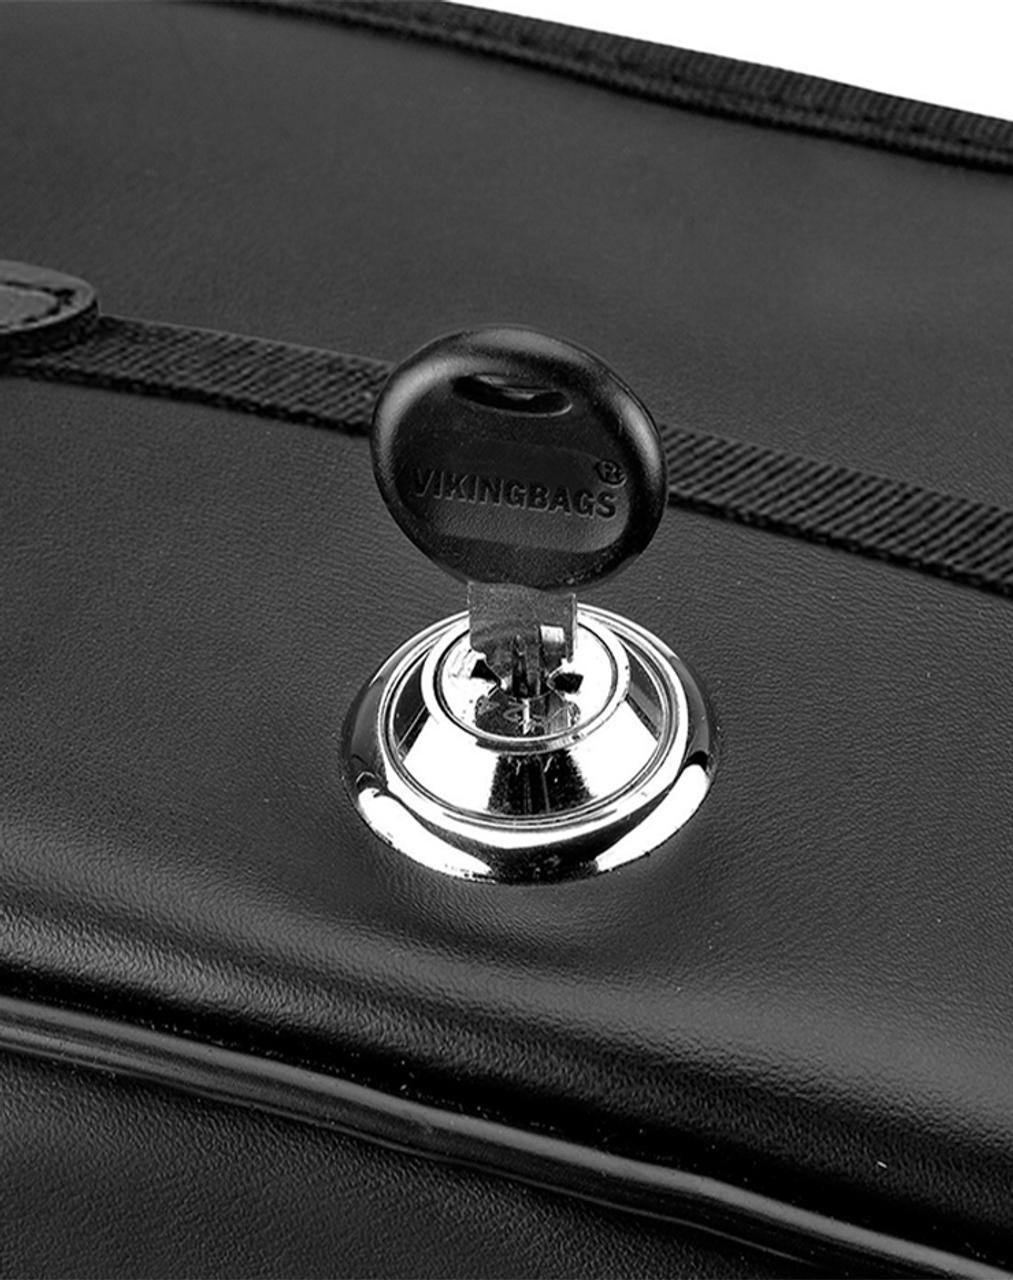 Honda 1500 Valkyrie Standard Ultimate Shape L Motorcycle saddlebags Key Lock View